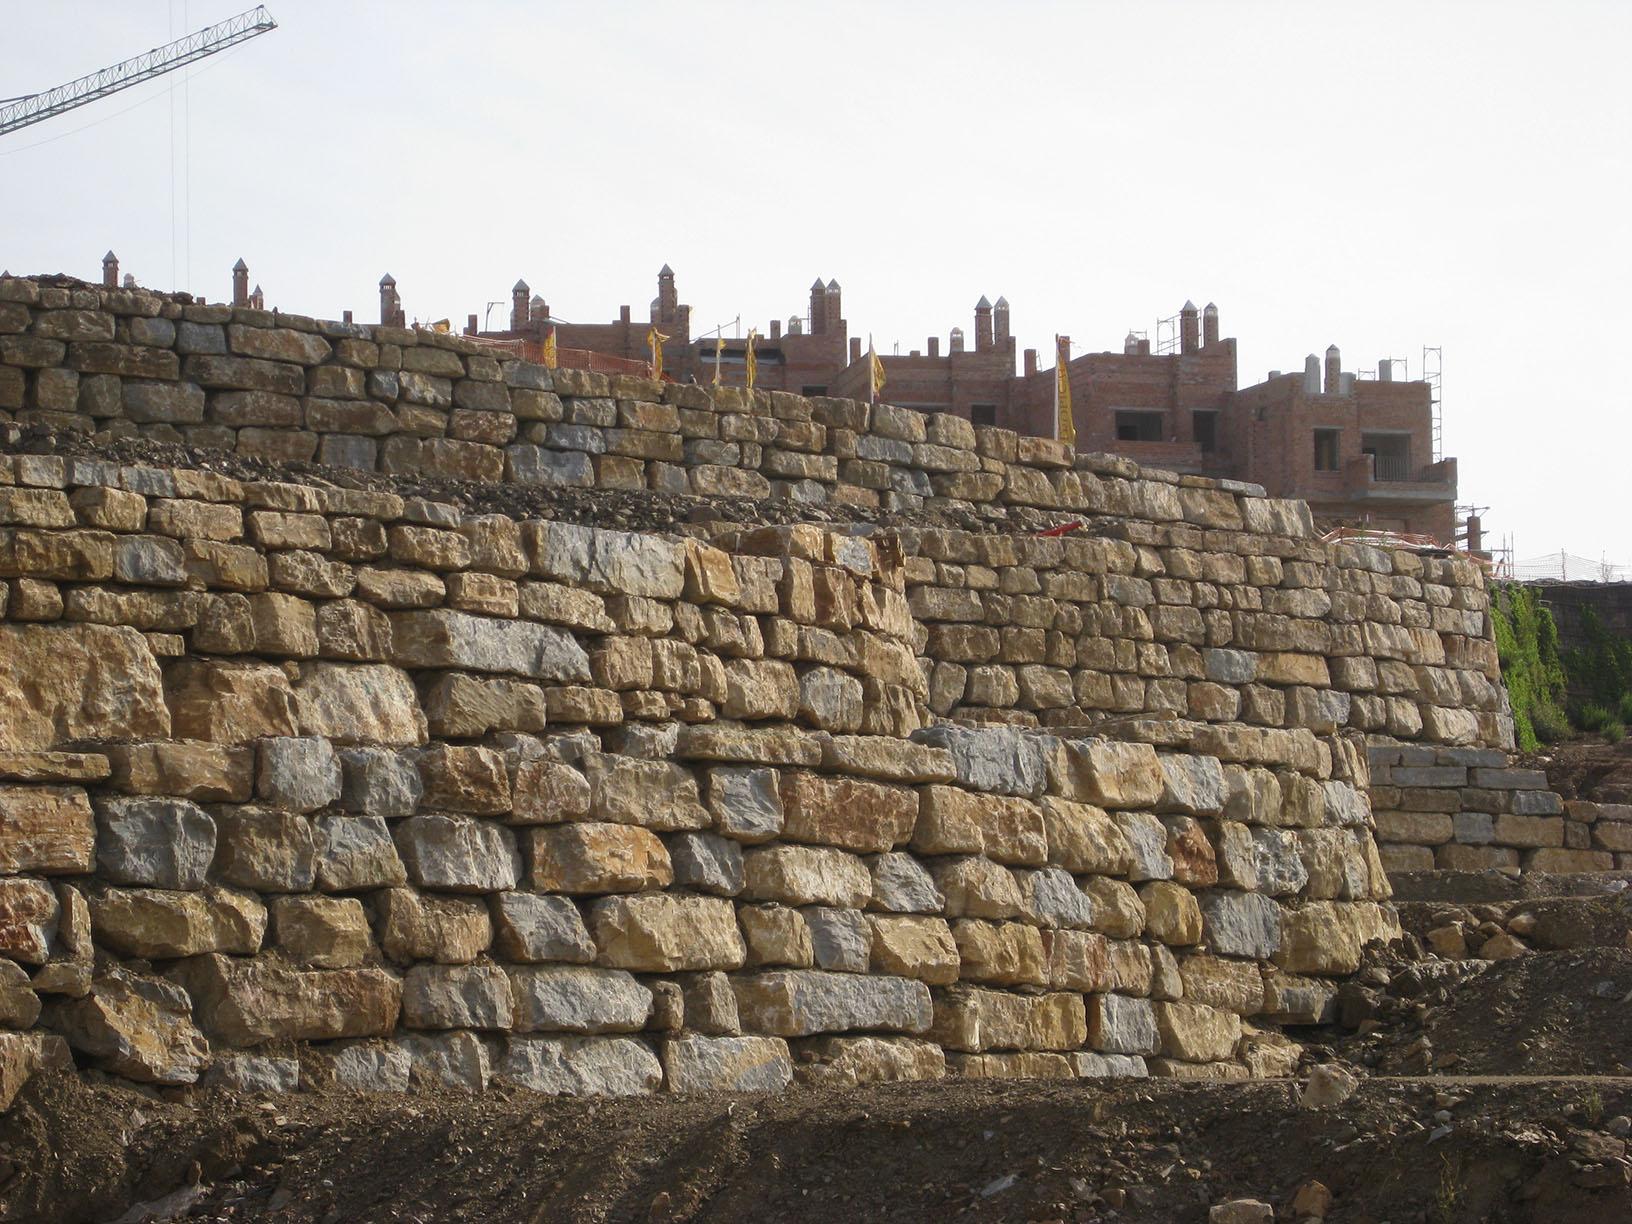 Piedras de escolleras tipo paralelep peda o irregular de - Tipos de muros de piedra ...